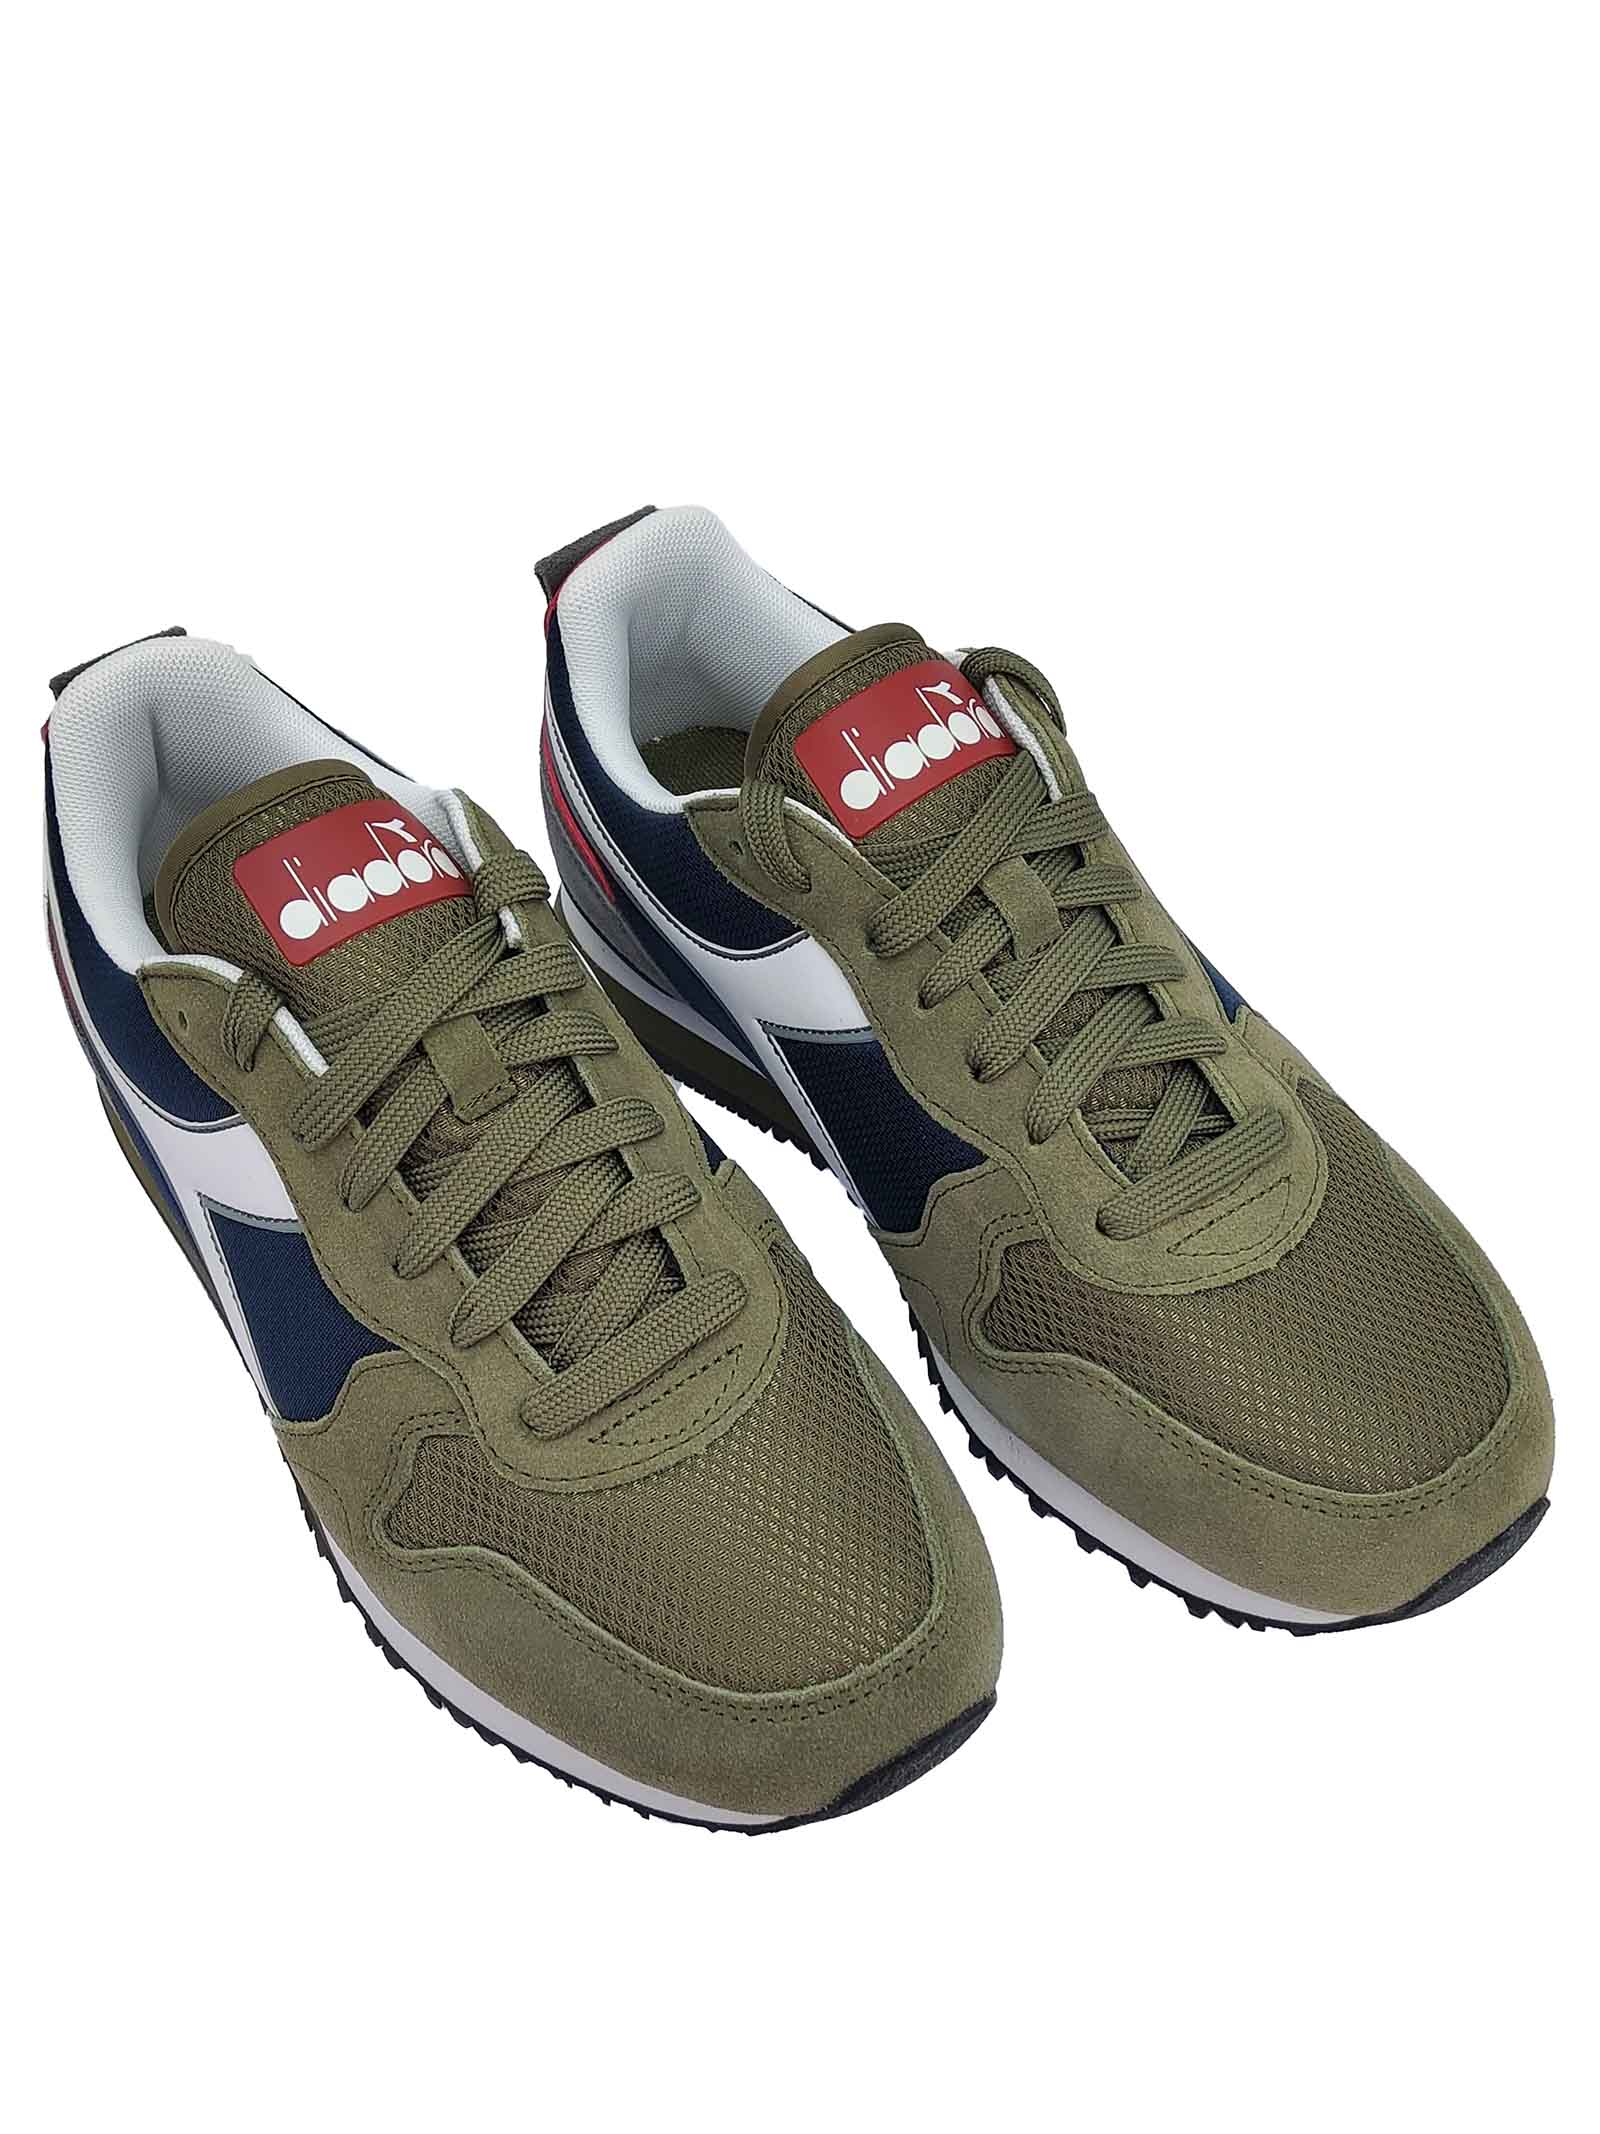 Calzature Uomo Sneakers Olympia in Tessuto ed Ecopelle Verde e Marrone 174376 Diadora | Sneakers | OLYMPIA70431